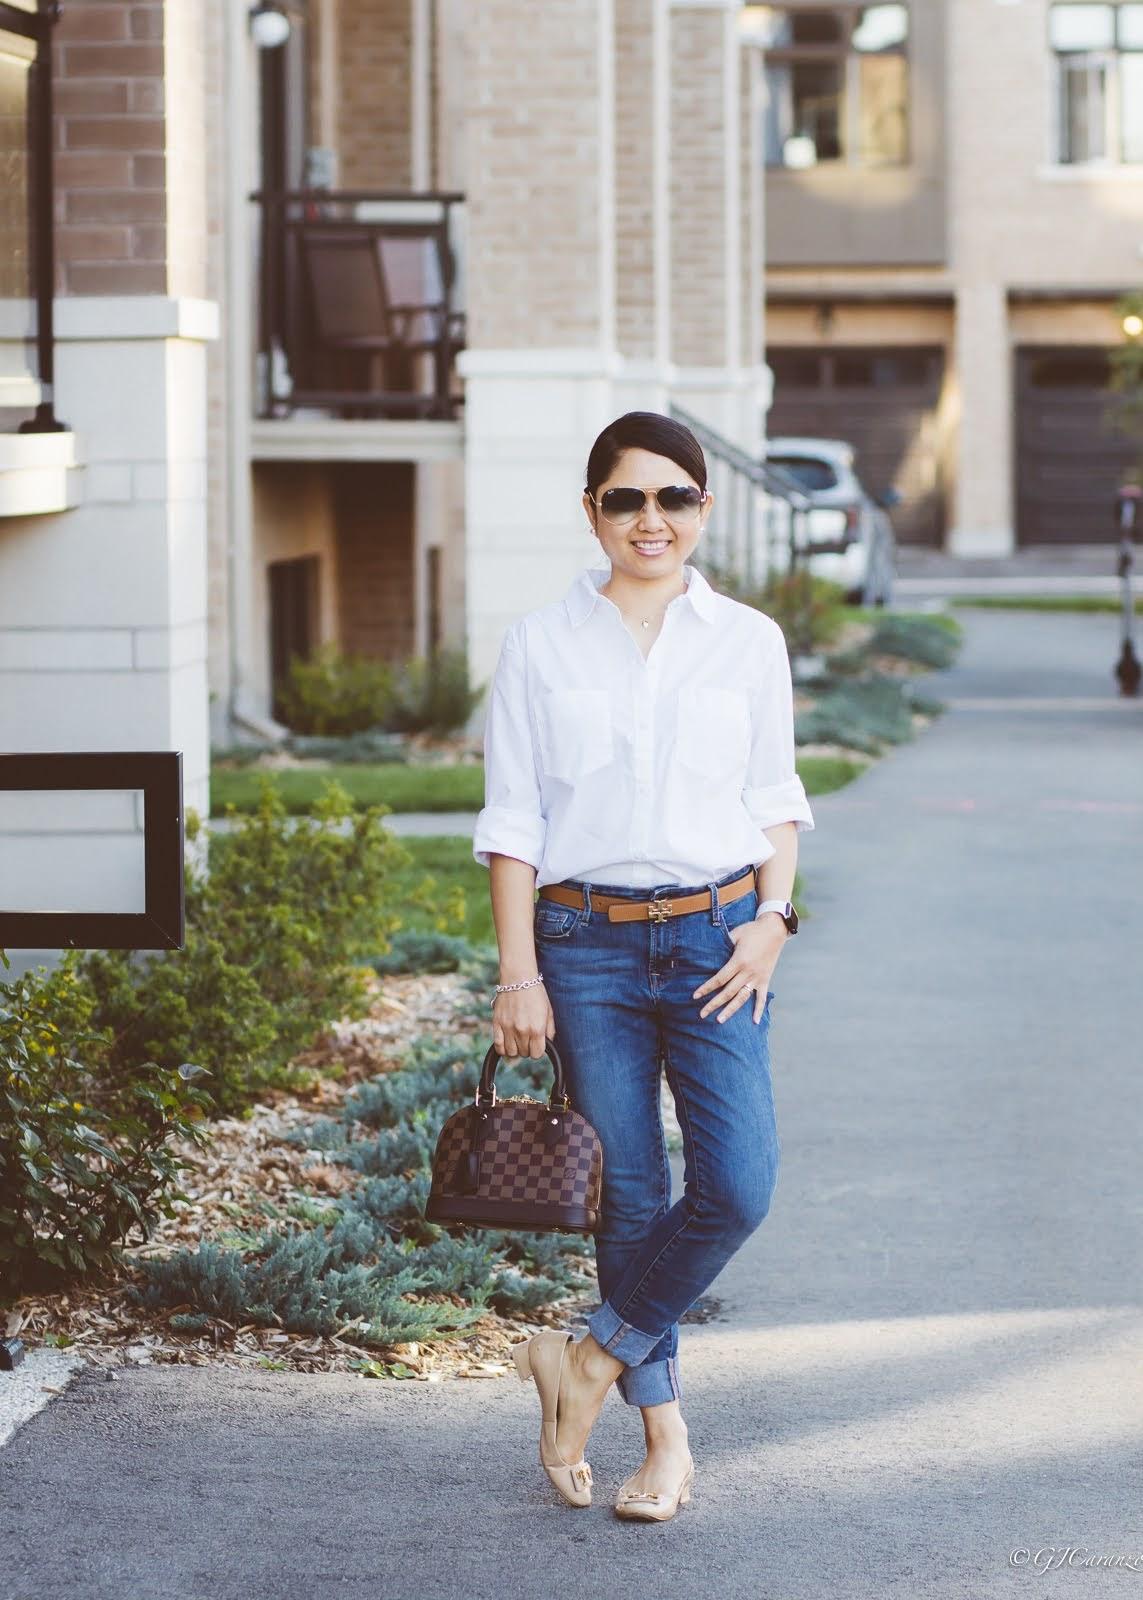 Levi Strauss White Shirt   Old Navy Blue Jeans   Tory Burch Reversible Belt   Ray Ban Aviator Sunglasses   Louis Vuitton Alma BB   Gigi Patent Pumps   Mom Style   Petite Fashion